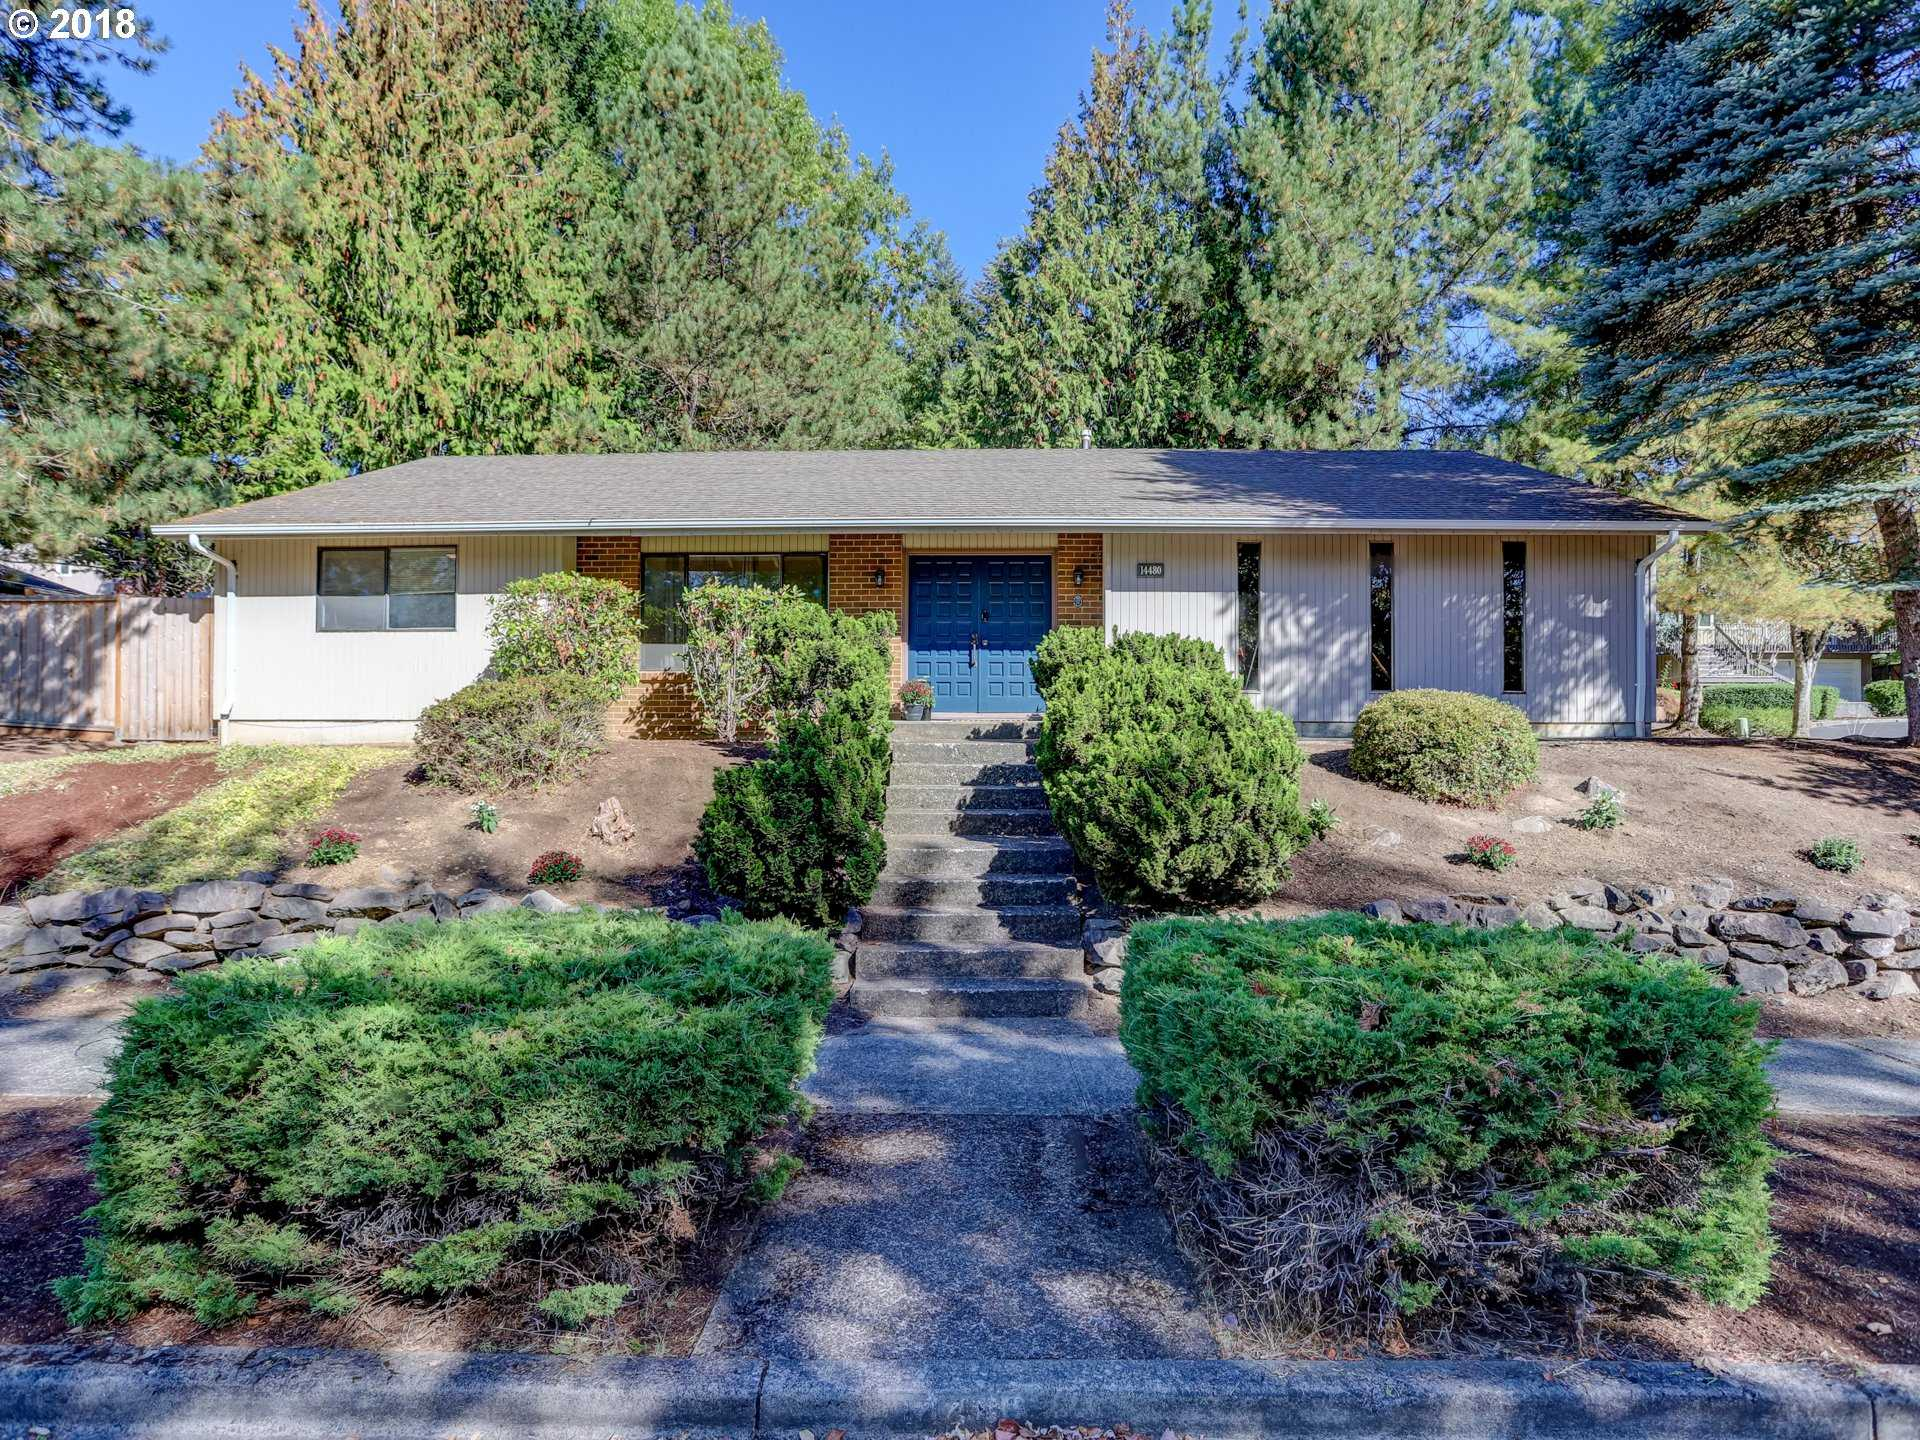 $364,900 - 3Br/2Ba -  for Sale in Beaverton